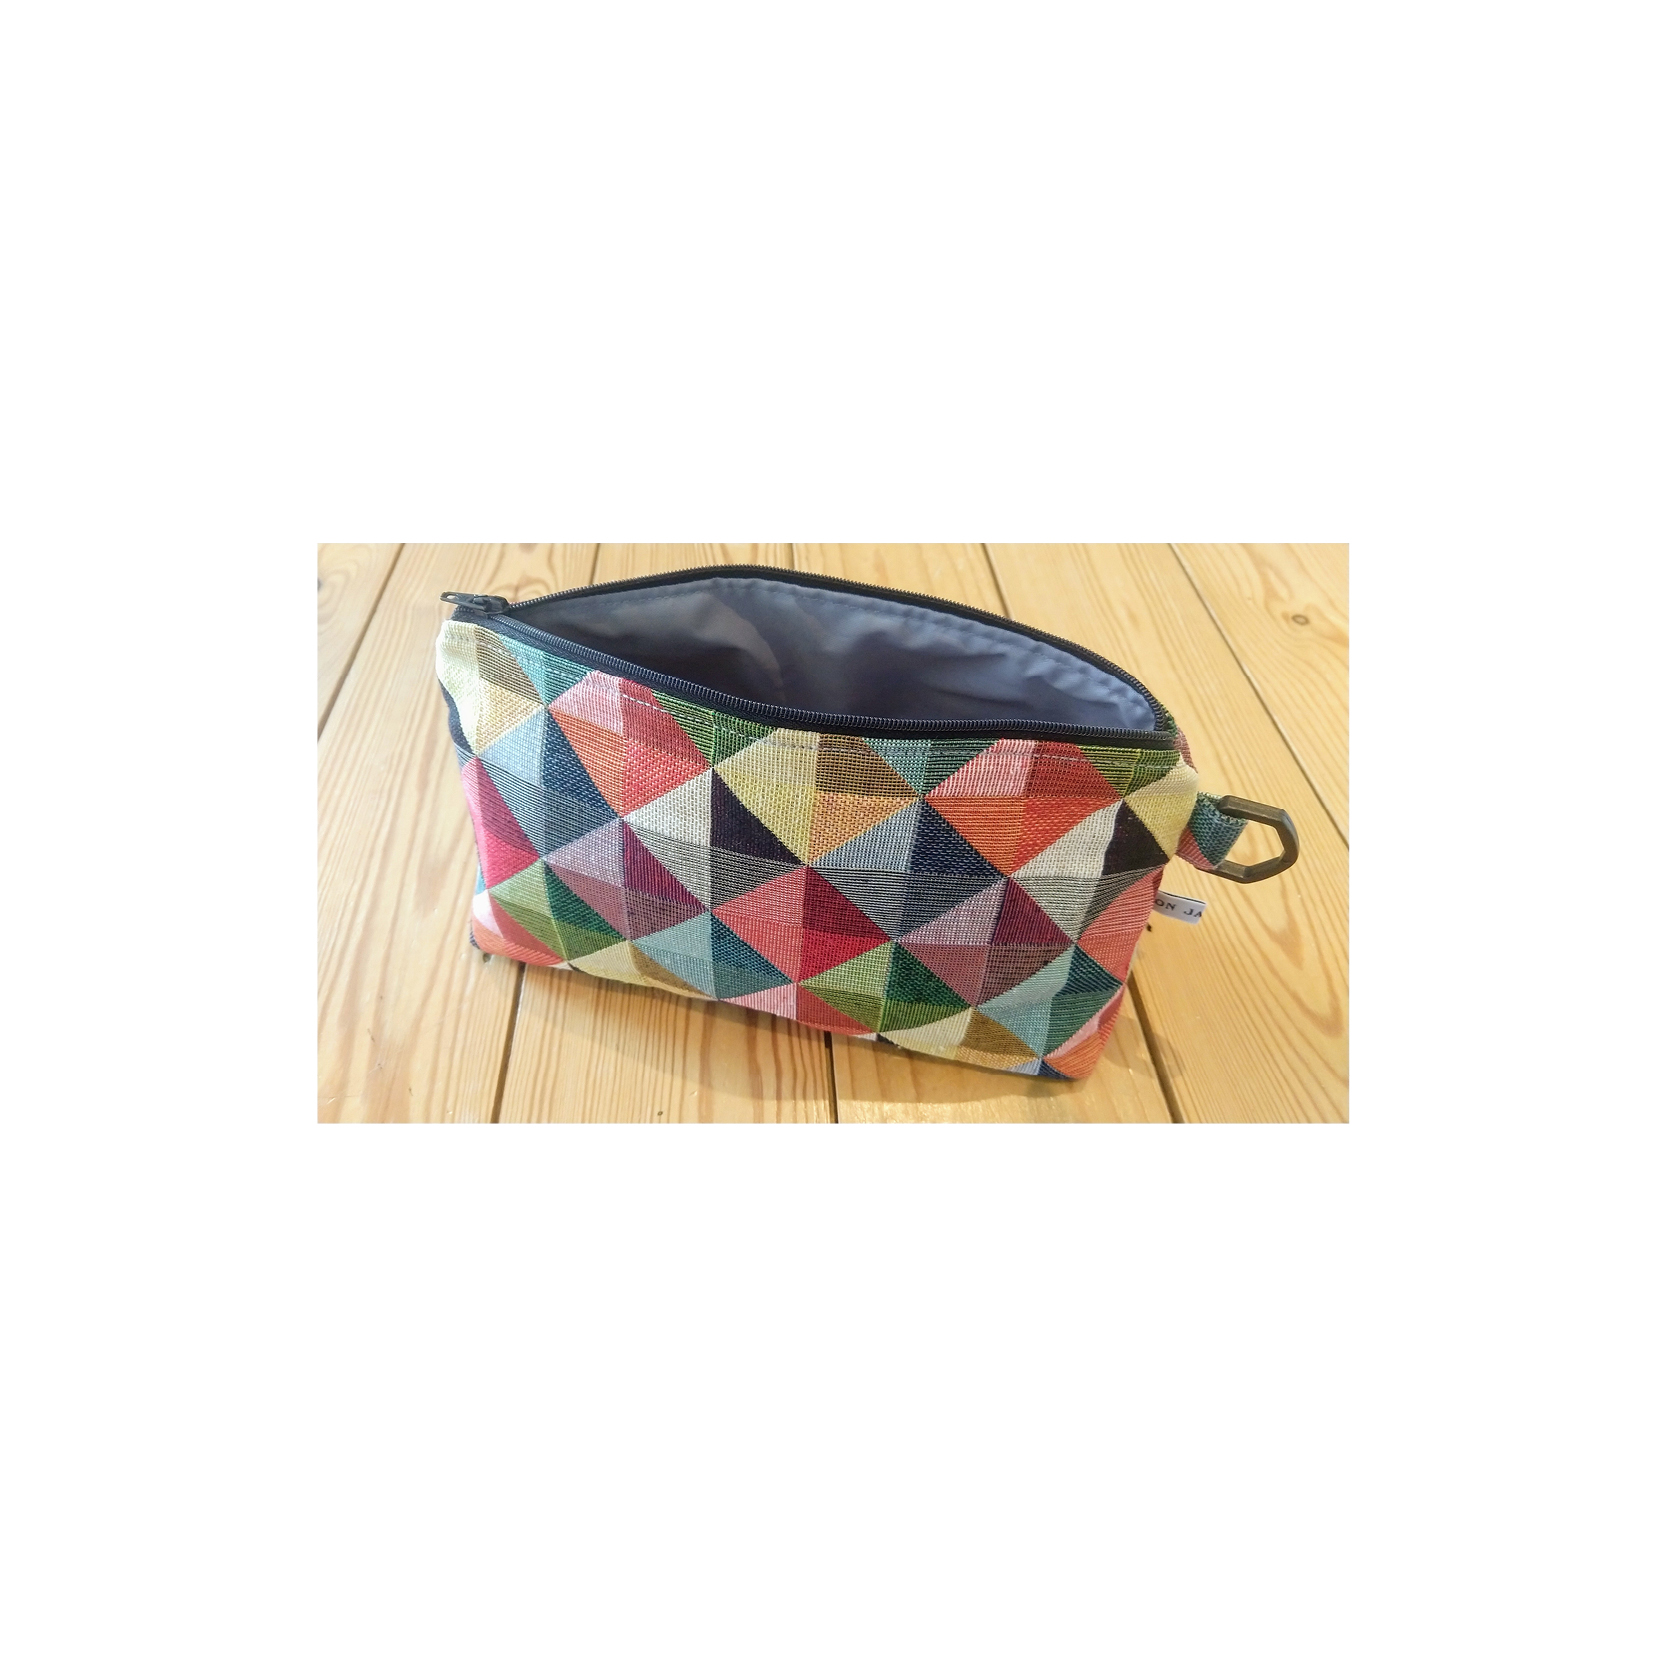 Ton Janmaat - Fabric wash bag Small